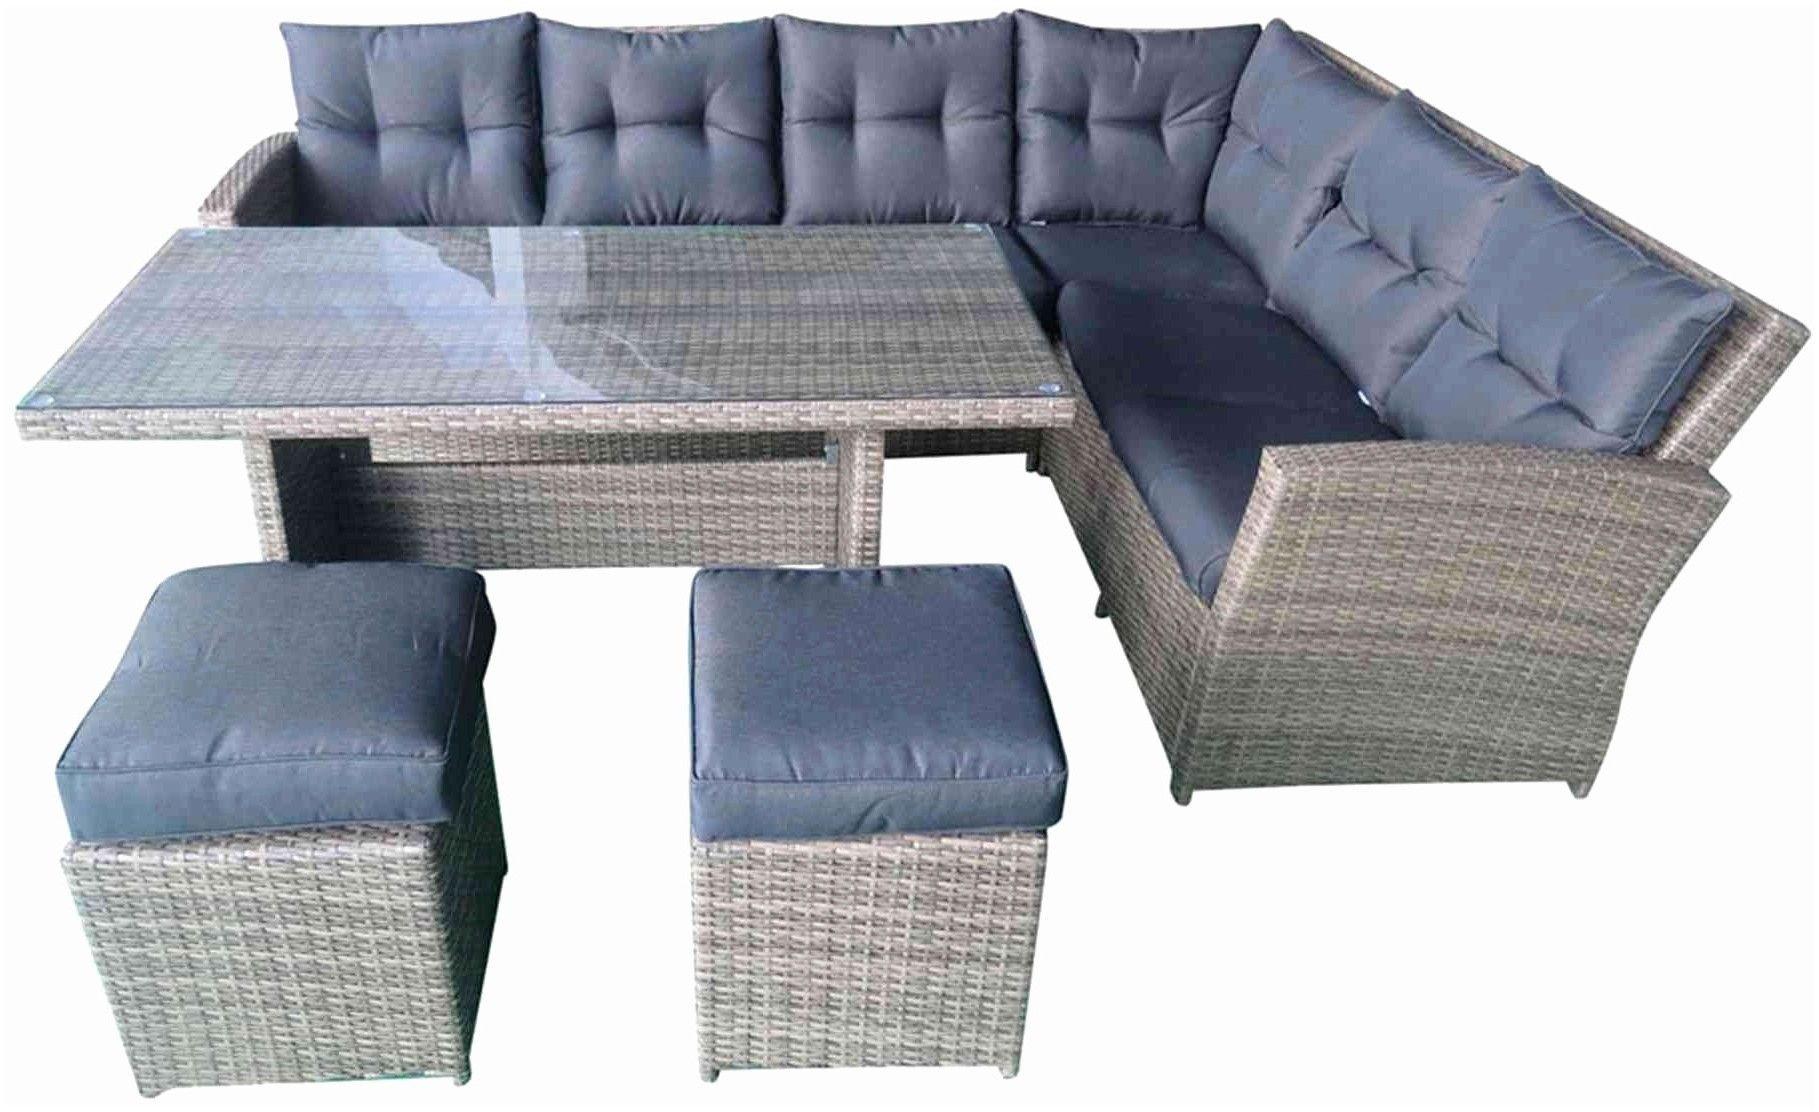 54 Concept Carrefour Meuble Salon intérieur Salon De Jardin Resine Carrefour